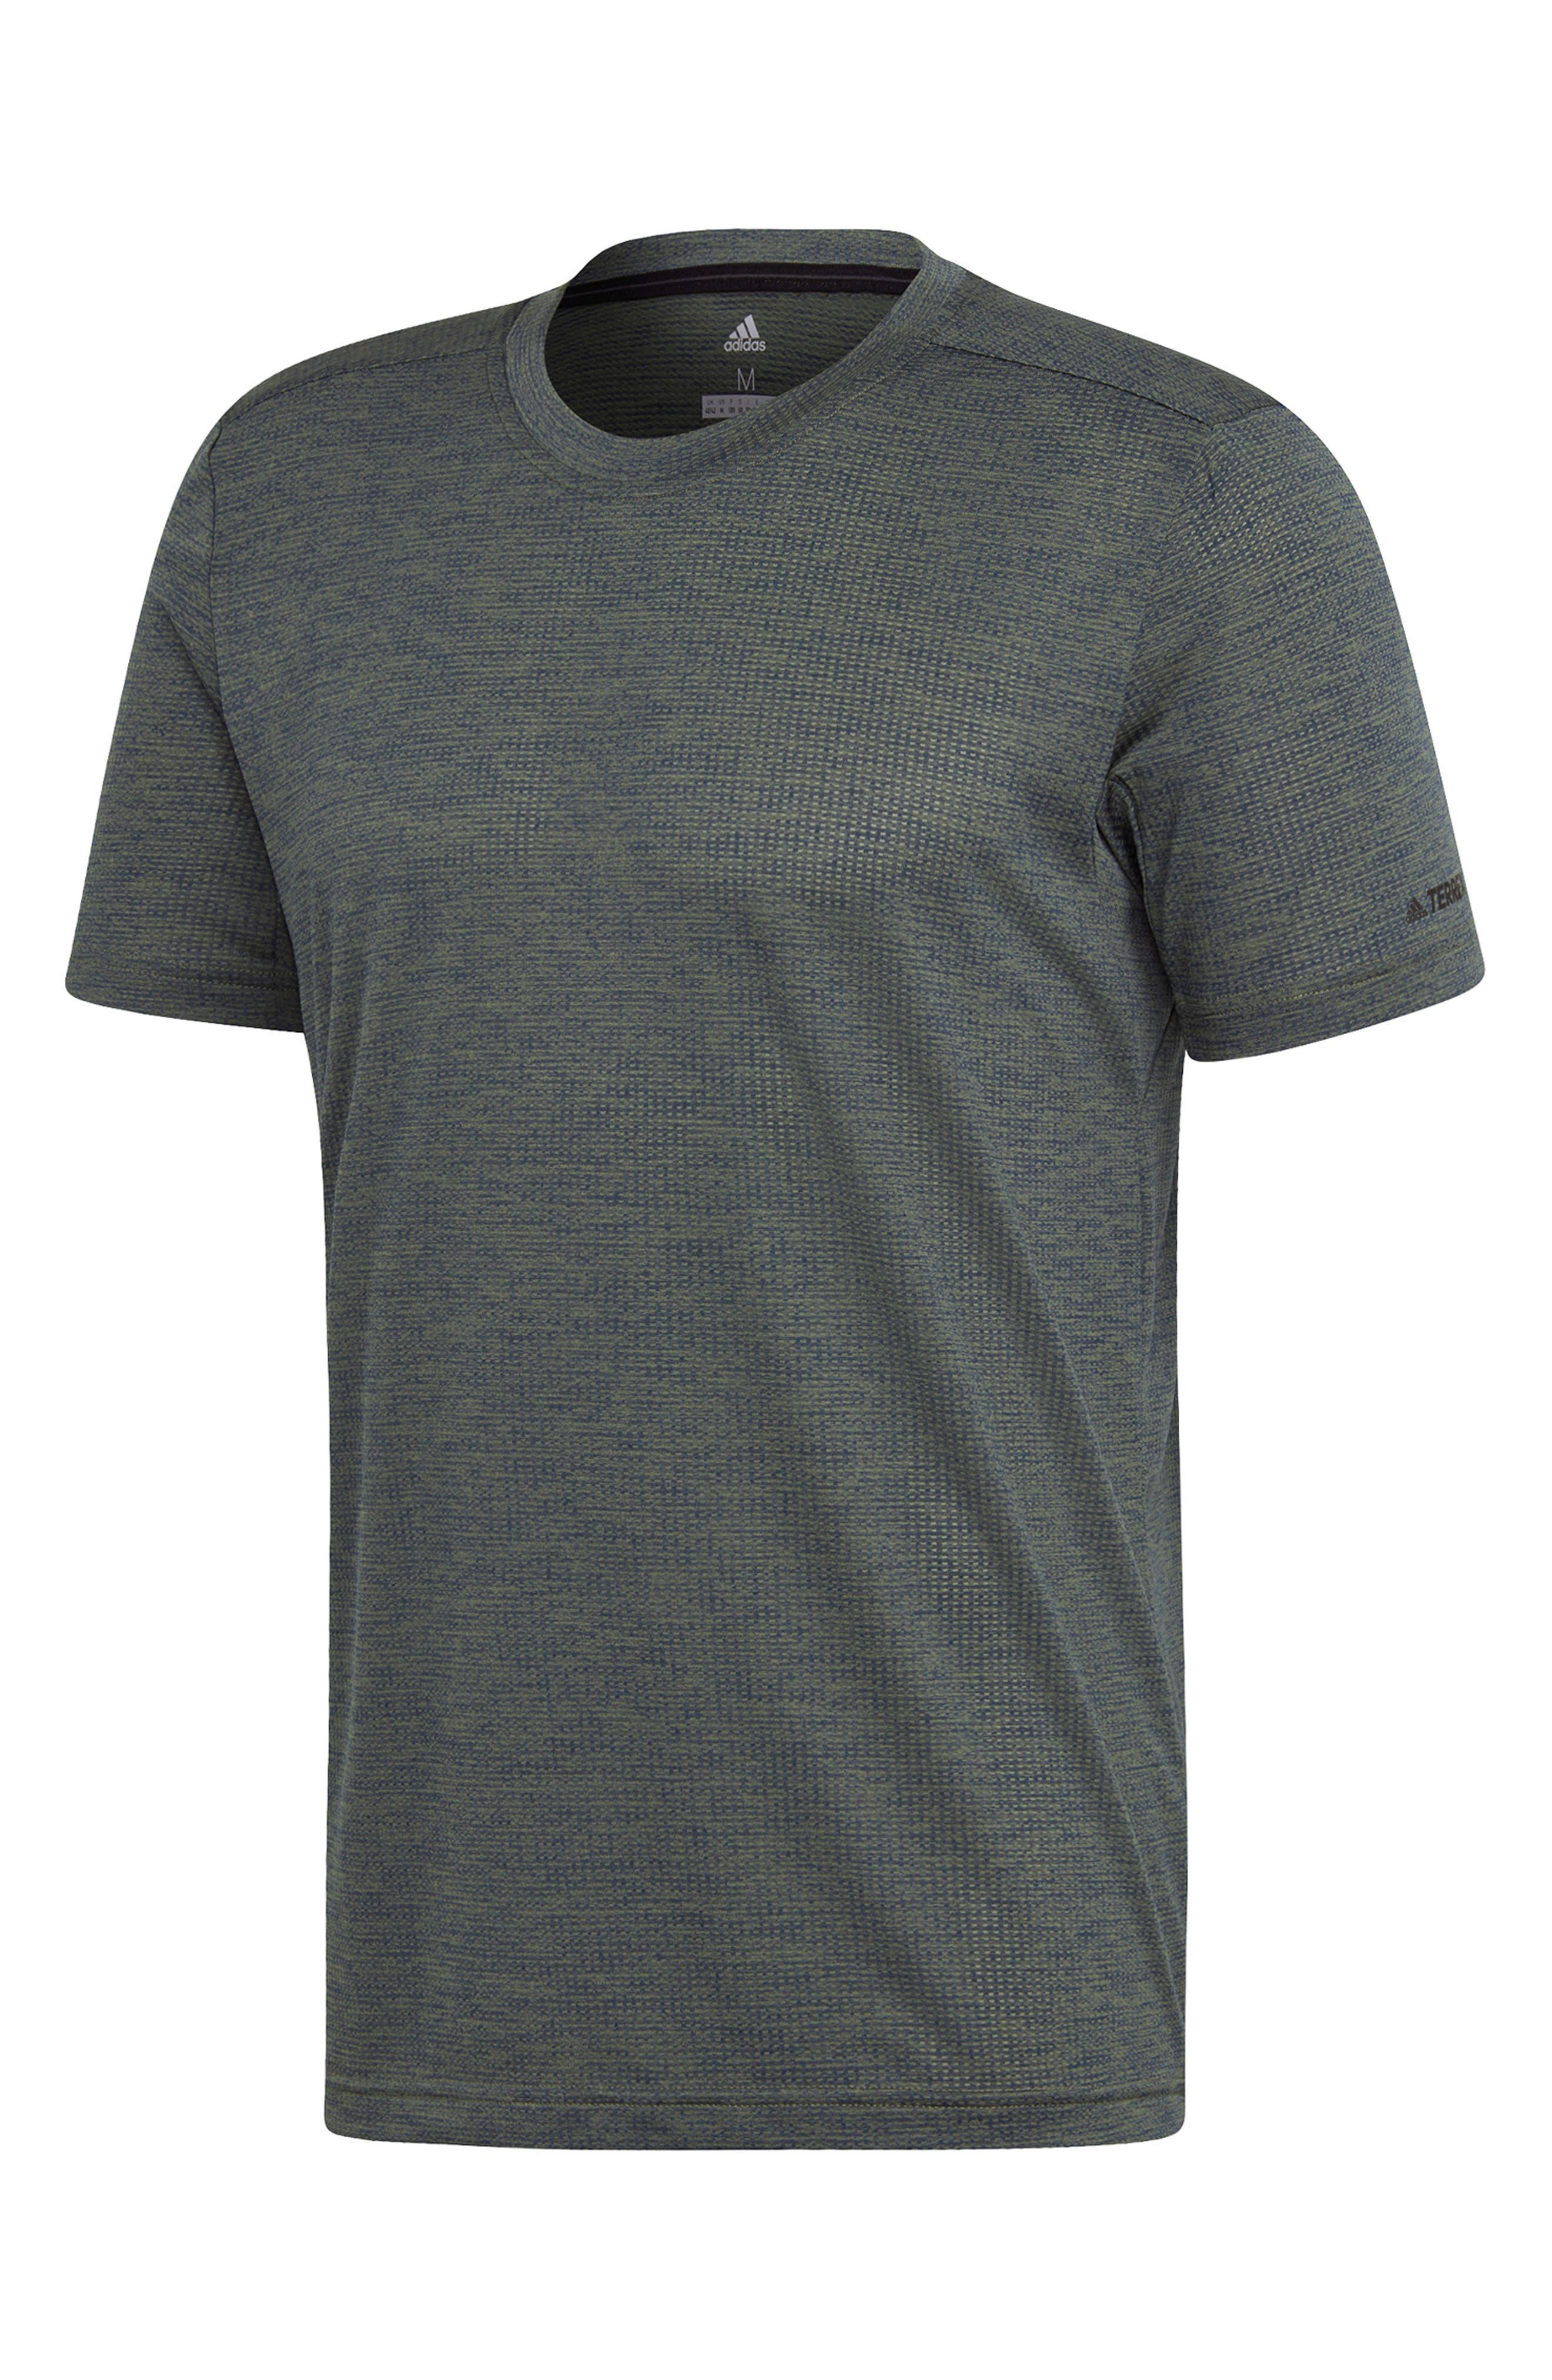 Adidas Tivid Climalite T-Shirt, Beige